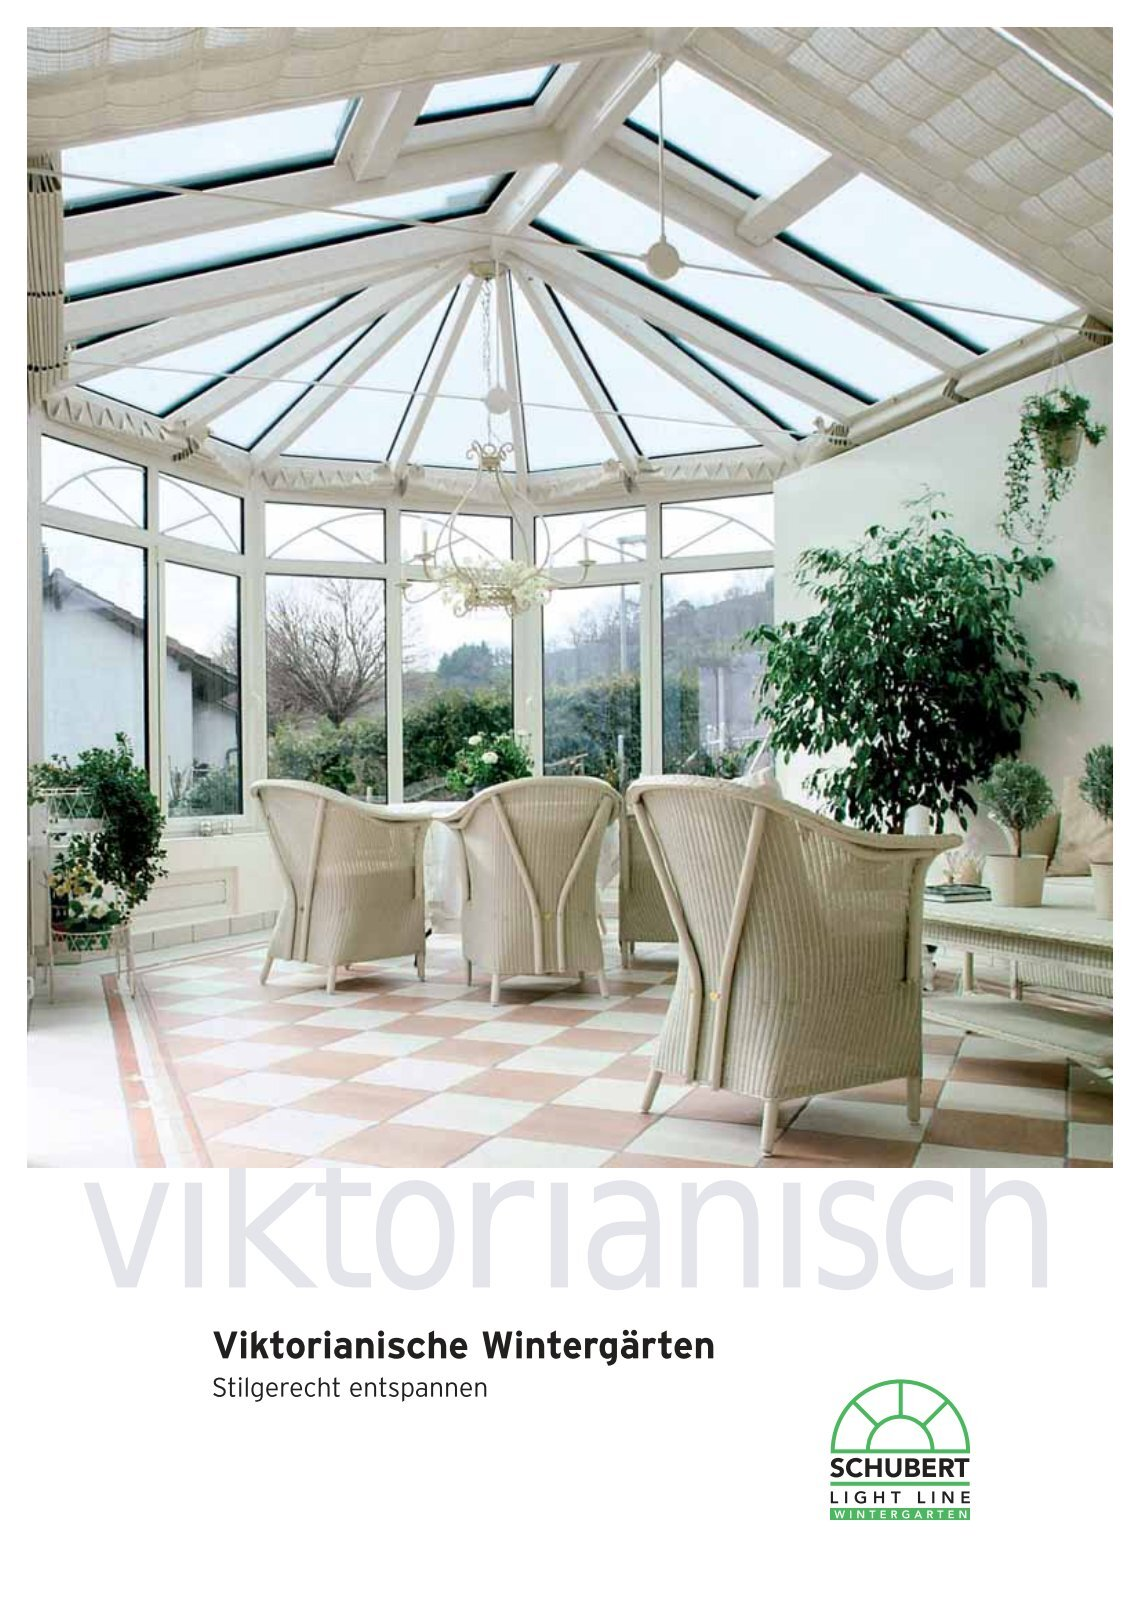 Viktorianische Wintergärten 2 free magazines from schubert wintergarten de